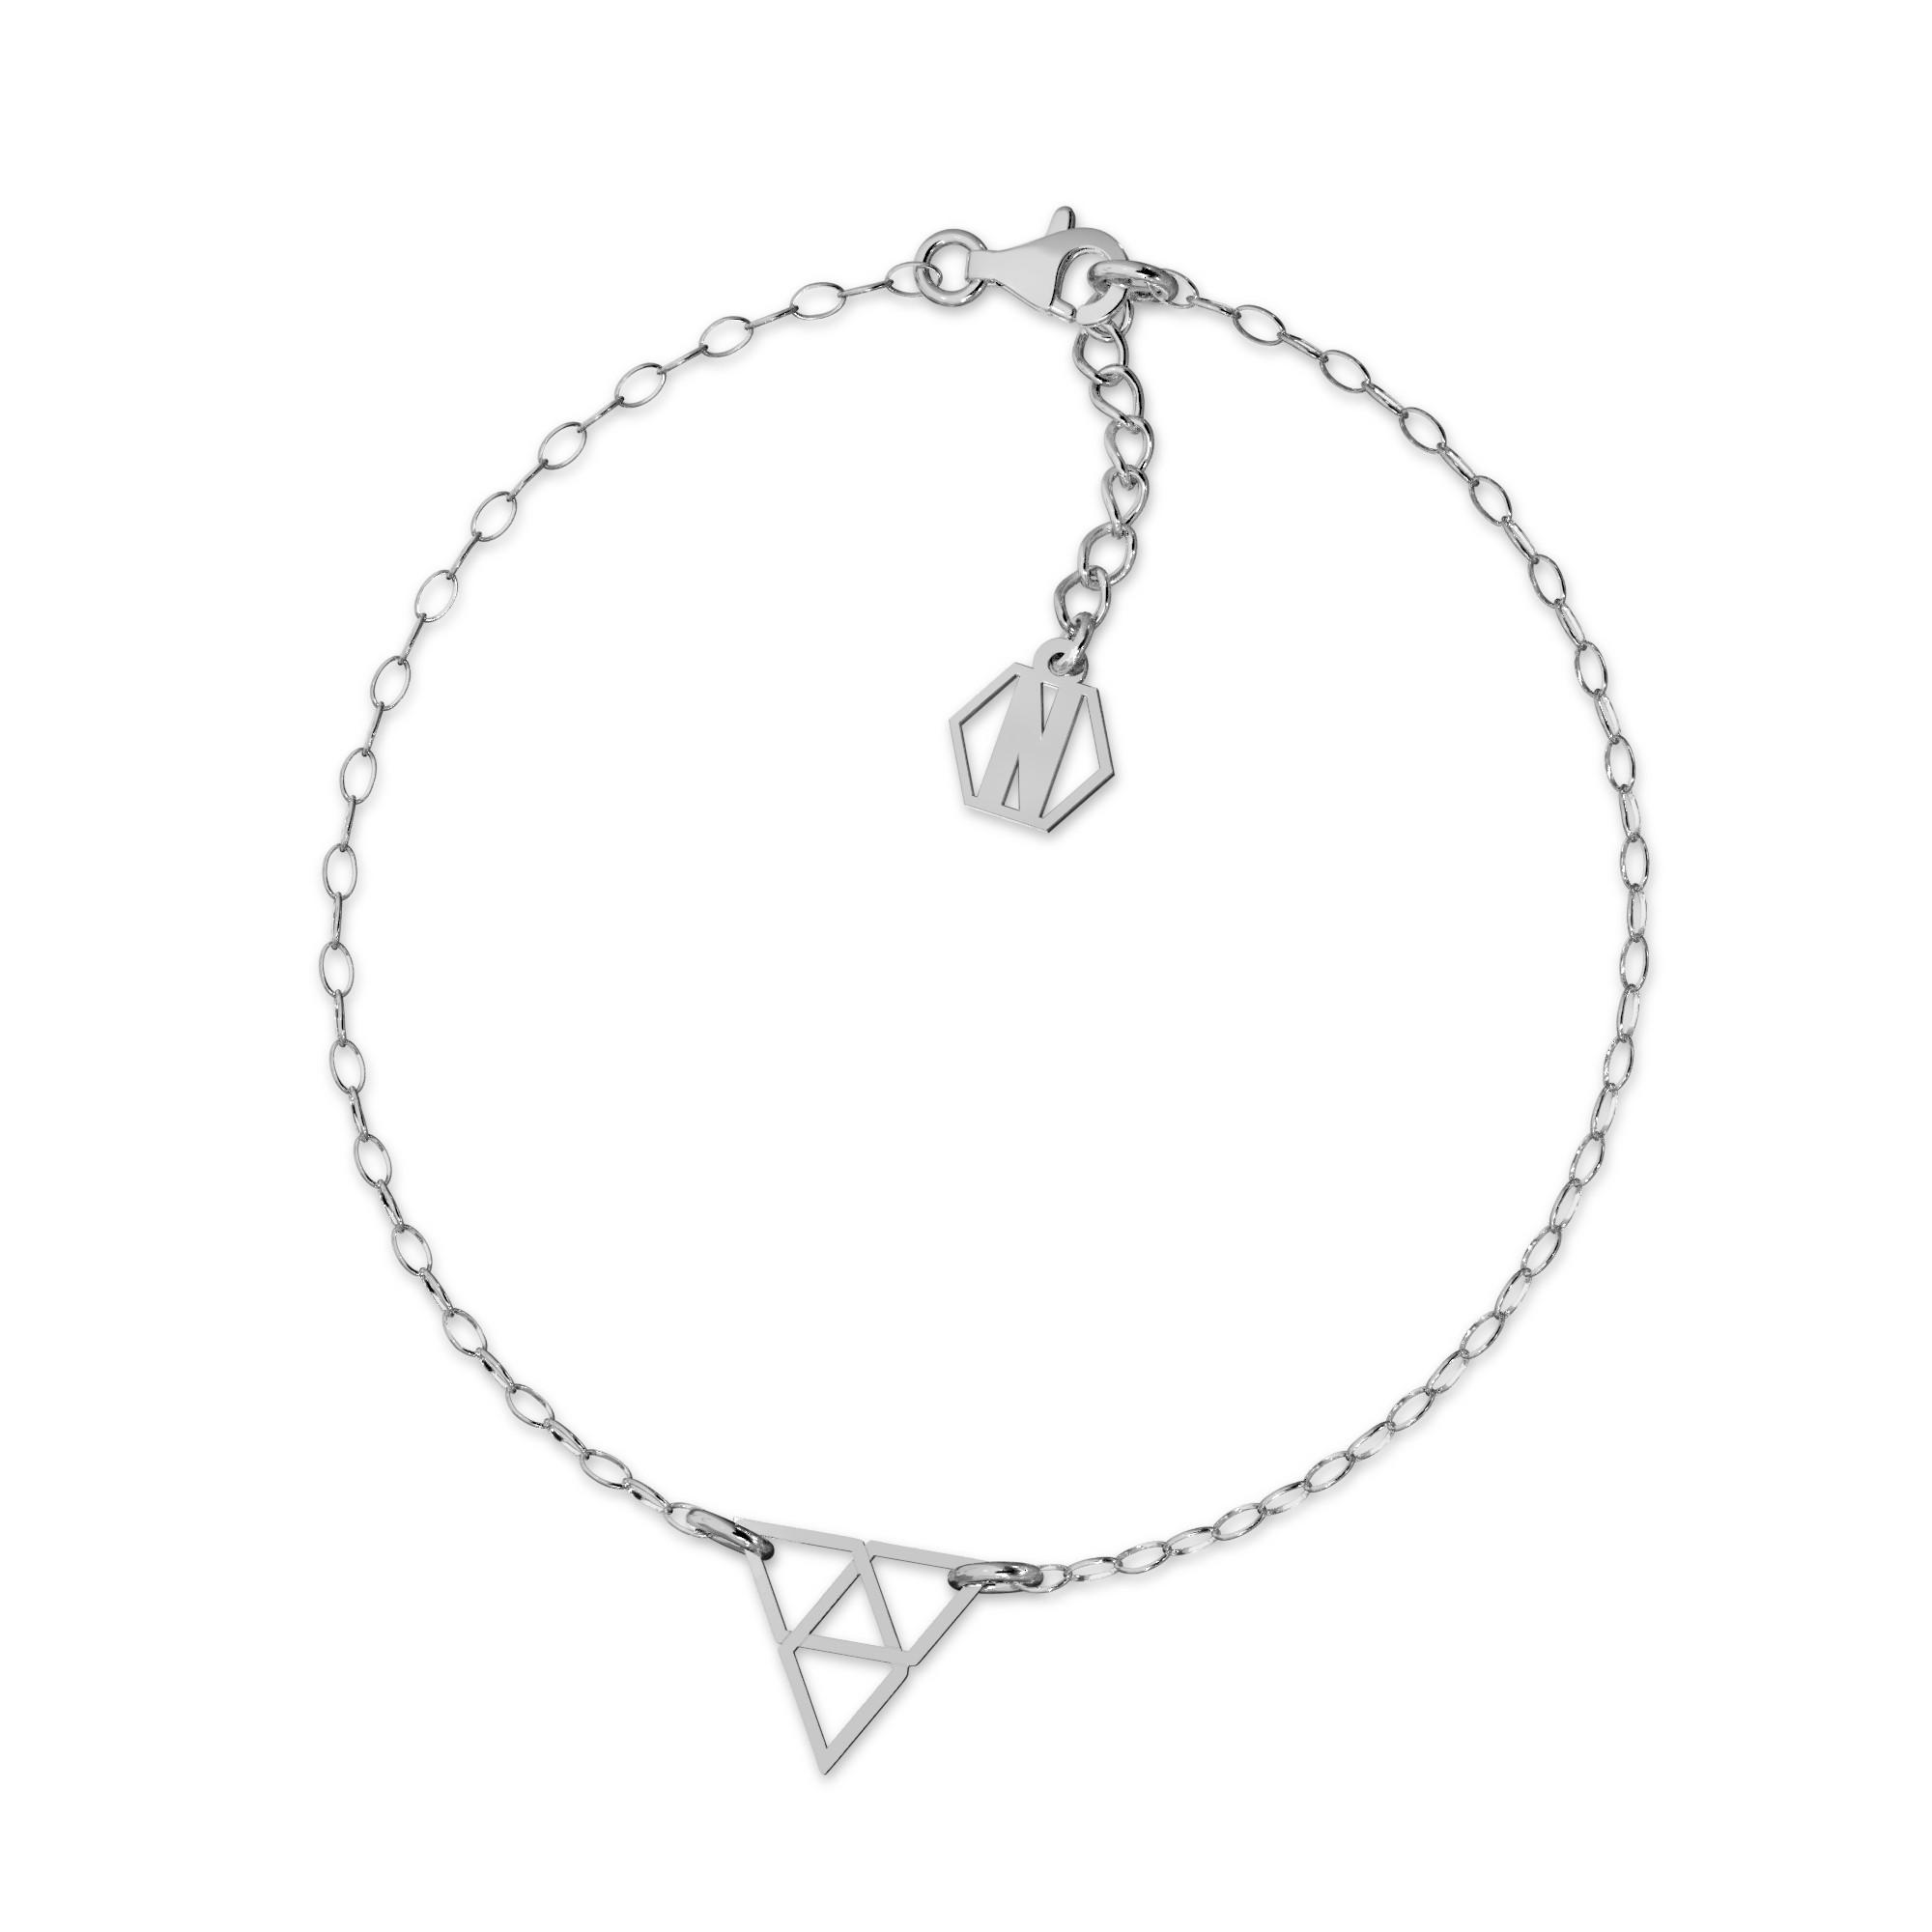 Srebrna bransoletka trójkąt srebro 925, Nikki Lund